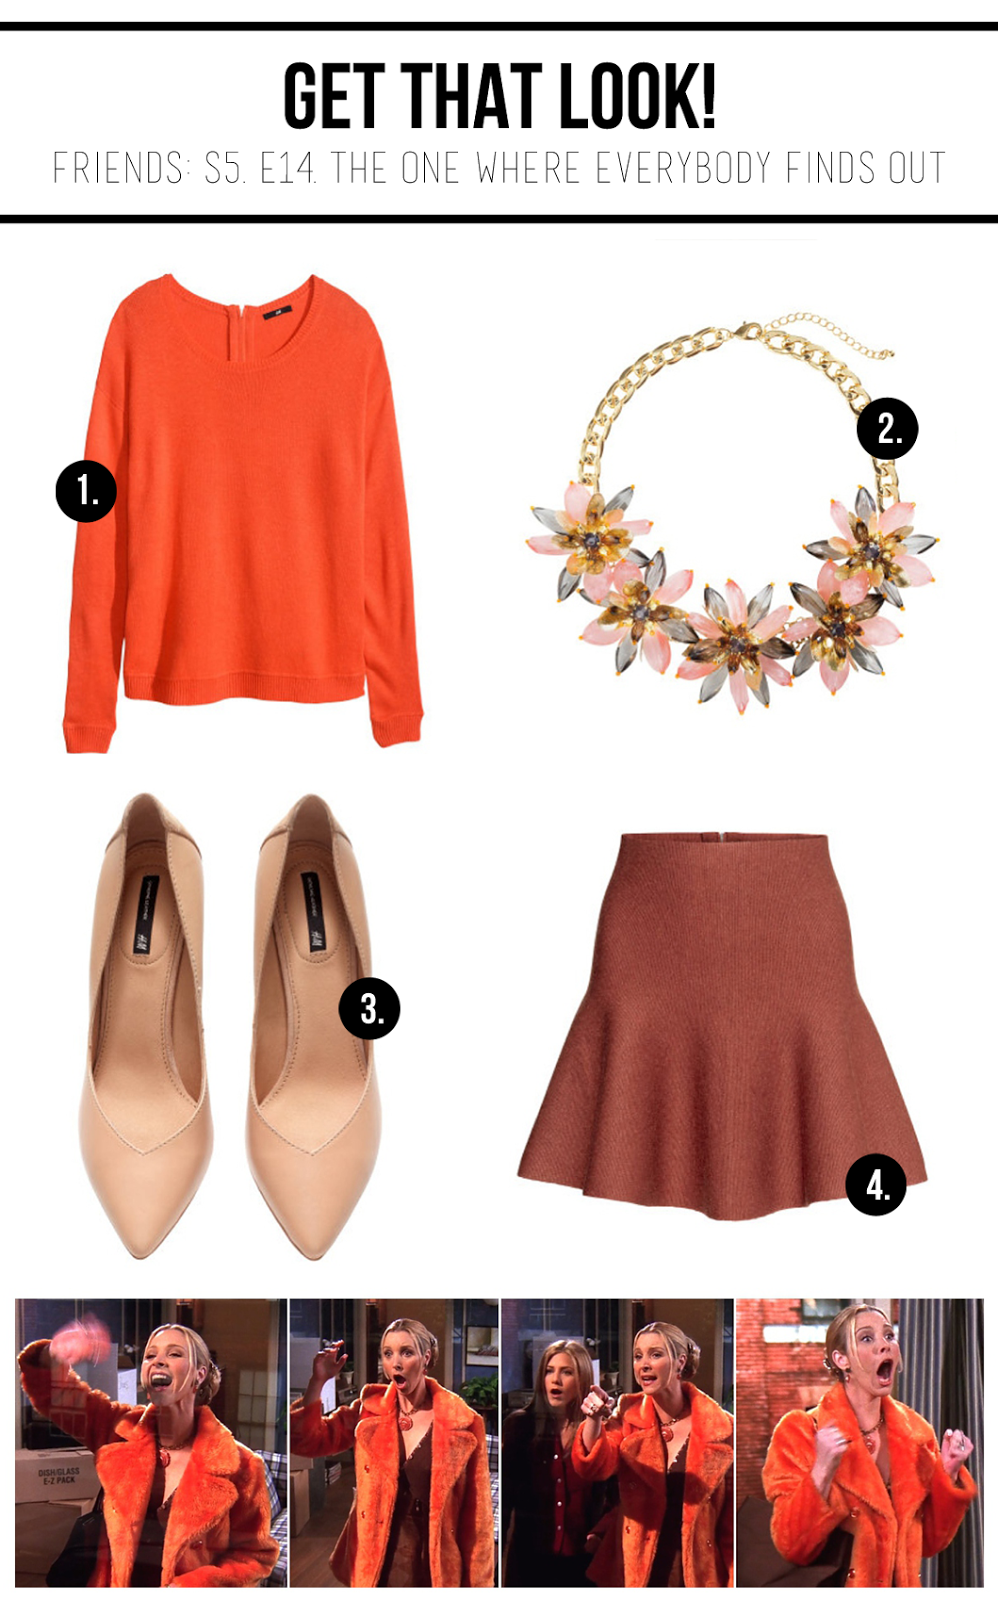 phoebe-buffay-friends-orange-clothes.png